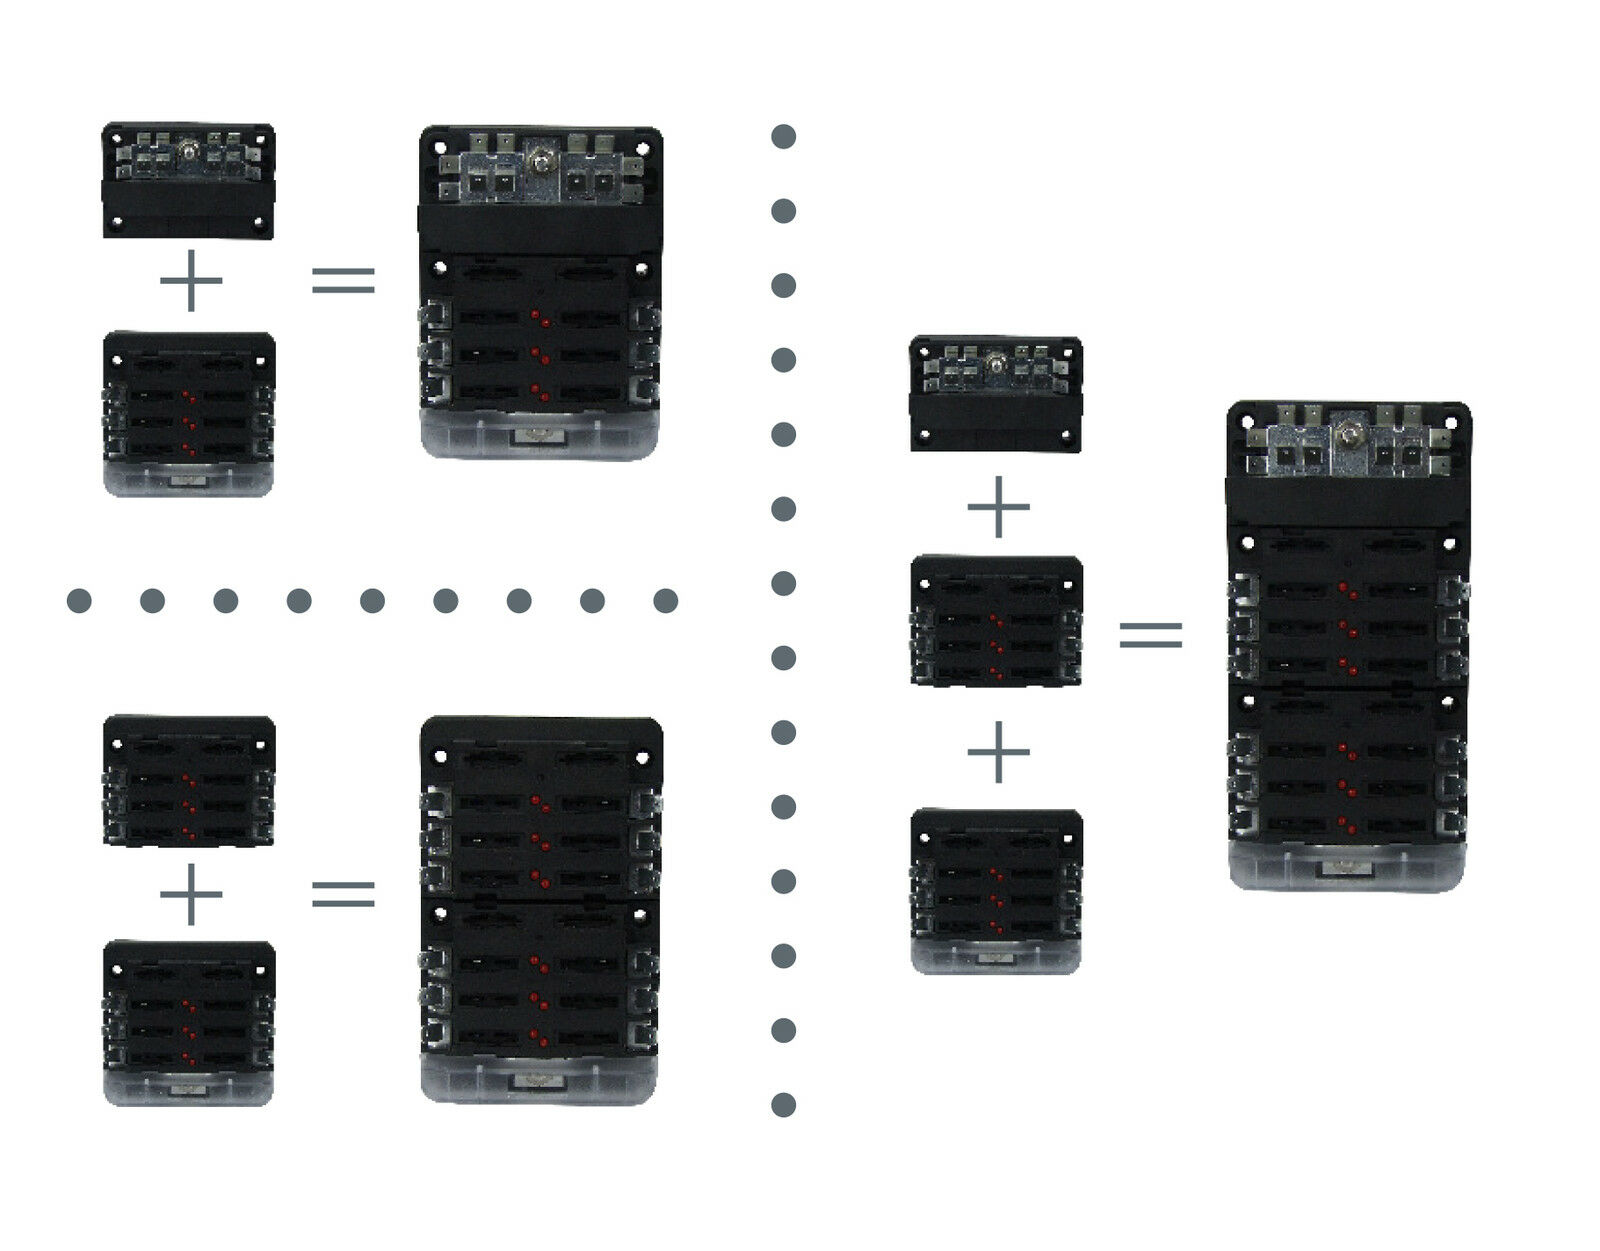 fuse box circuit buss bar 12 way with 6 circuit fuse box modular kit 12v ... buss fuse box circuit builder